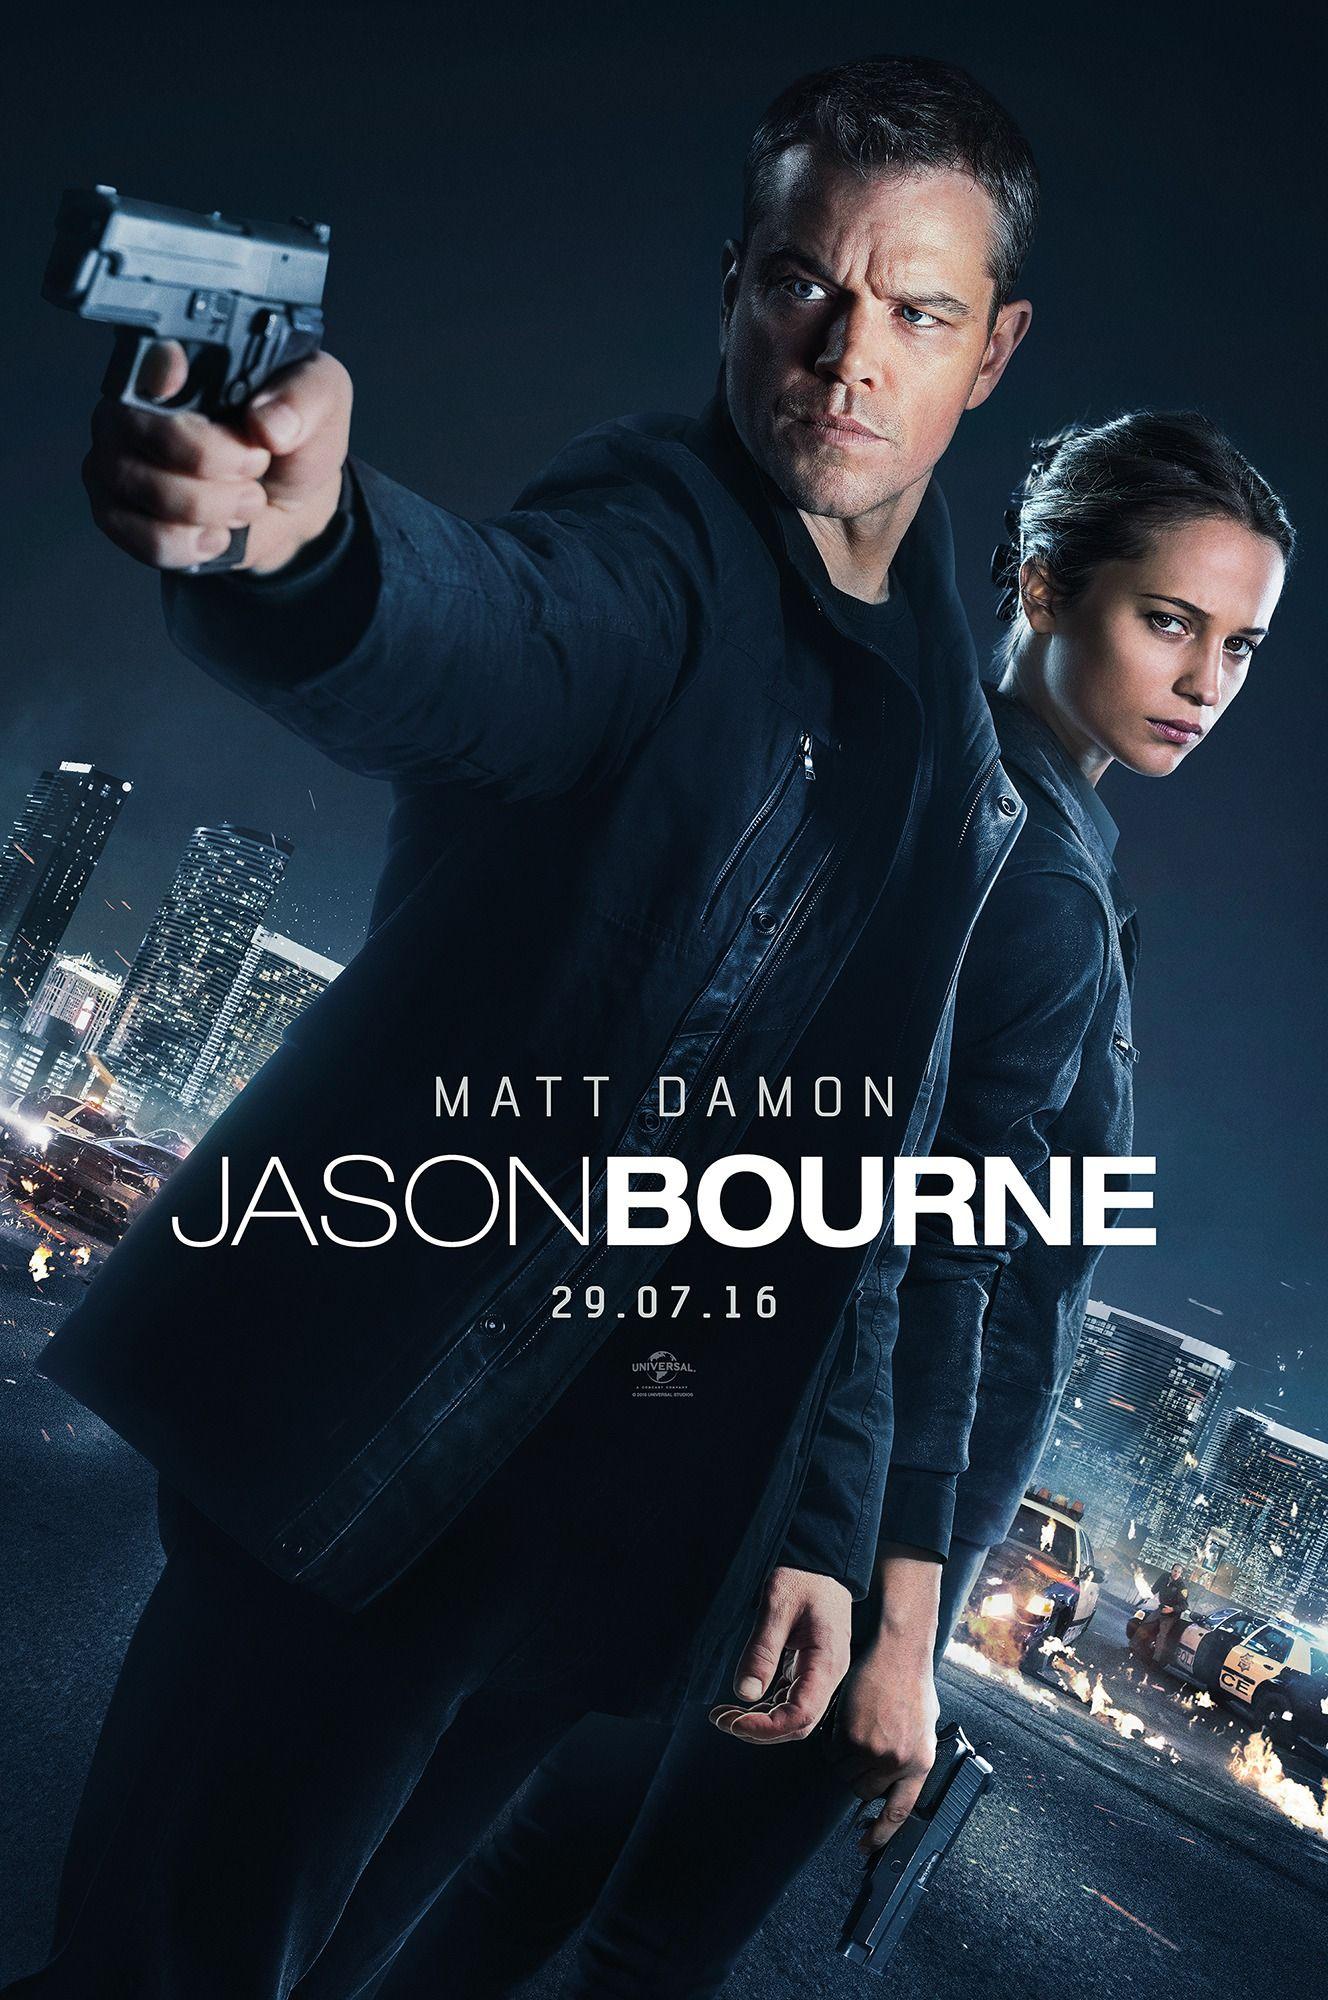 Jason Bourne 2016 Official Movie Poster Jason Bourne Movie Bourne Movies Jason Bourne 2016